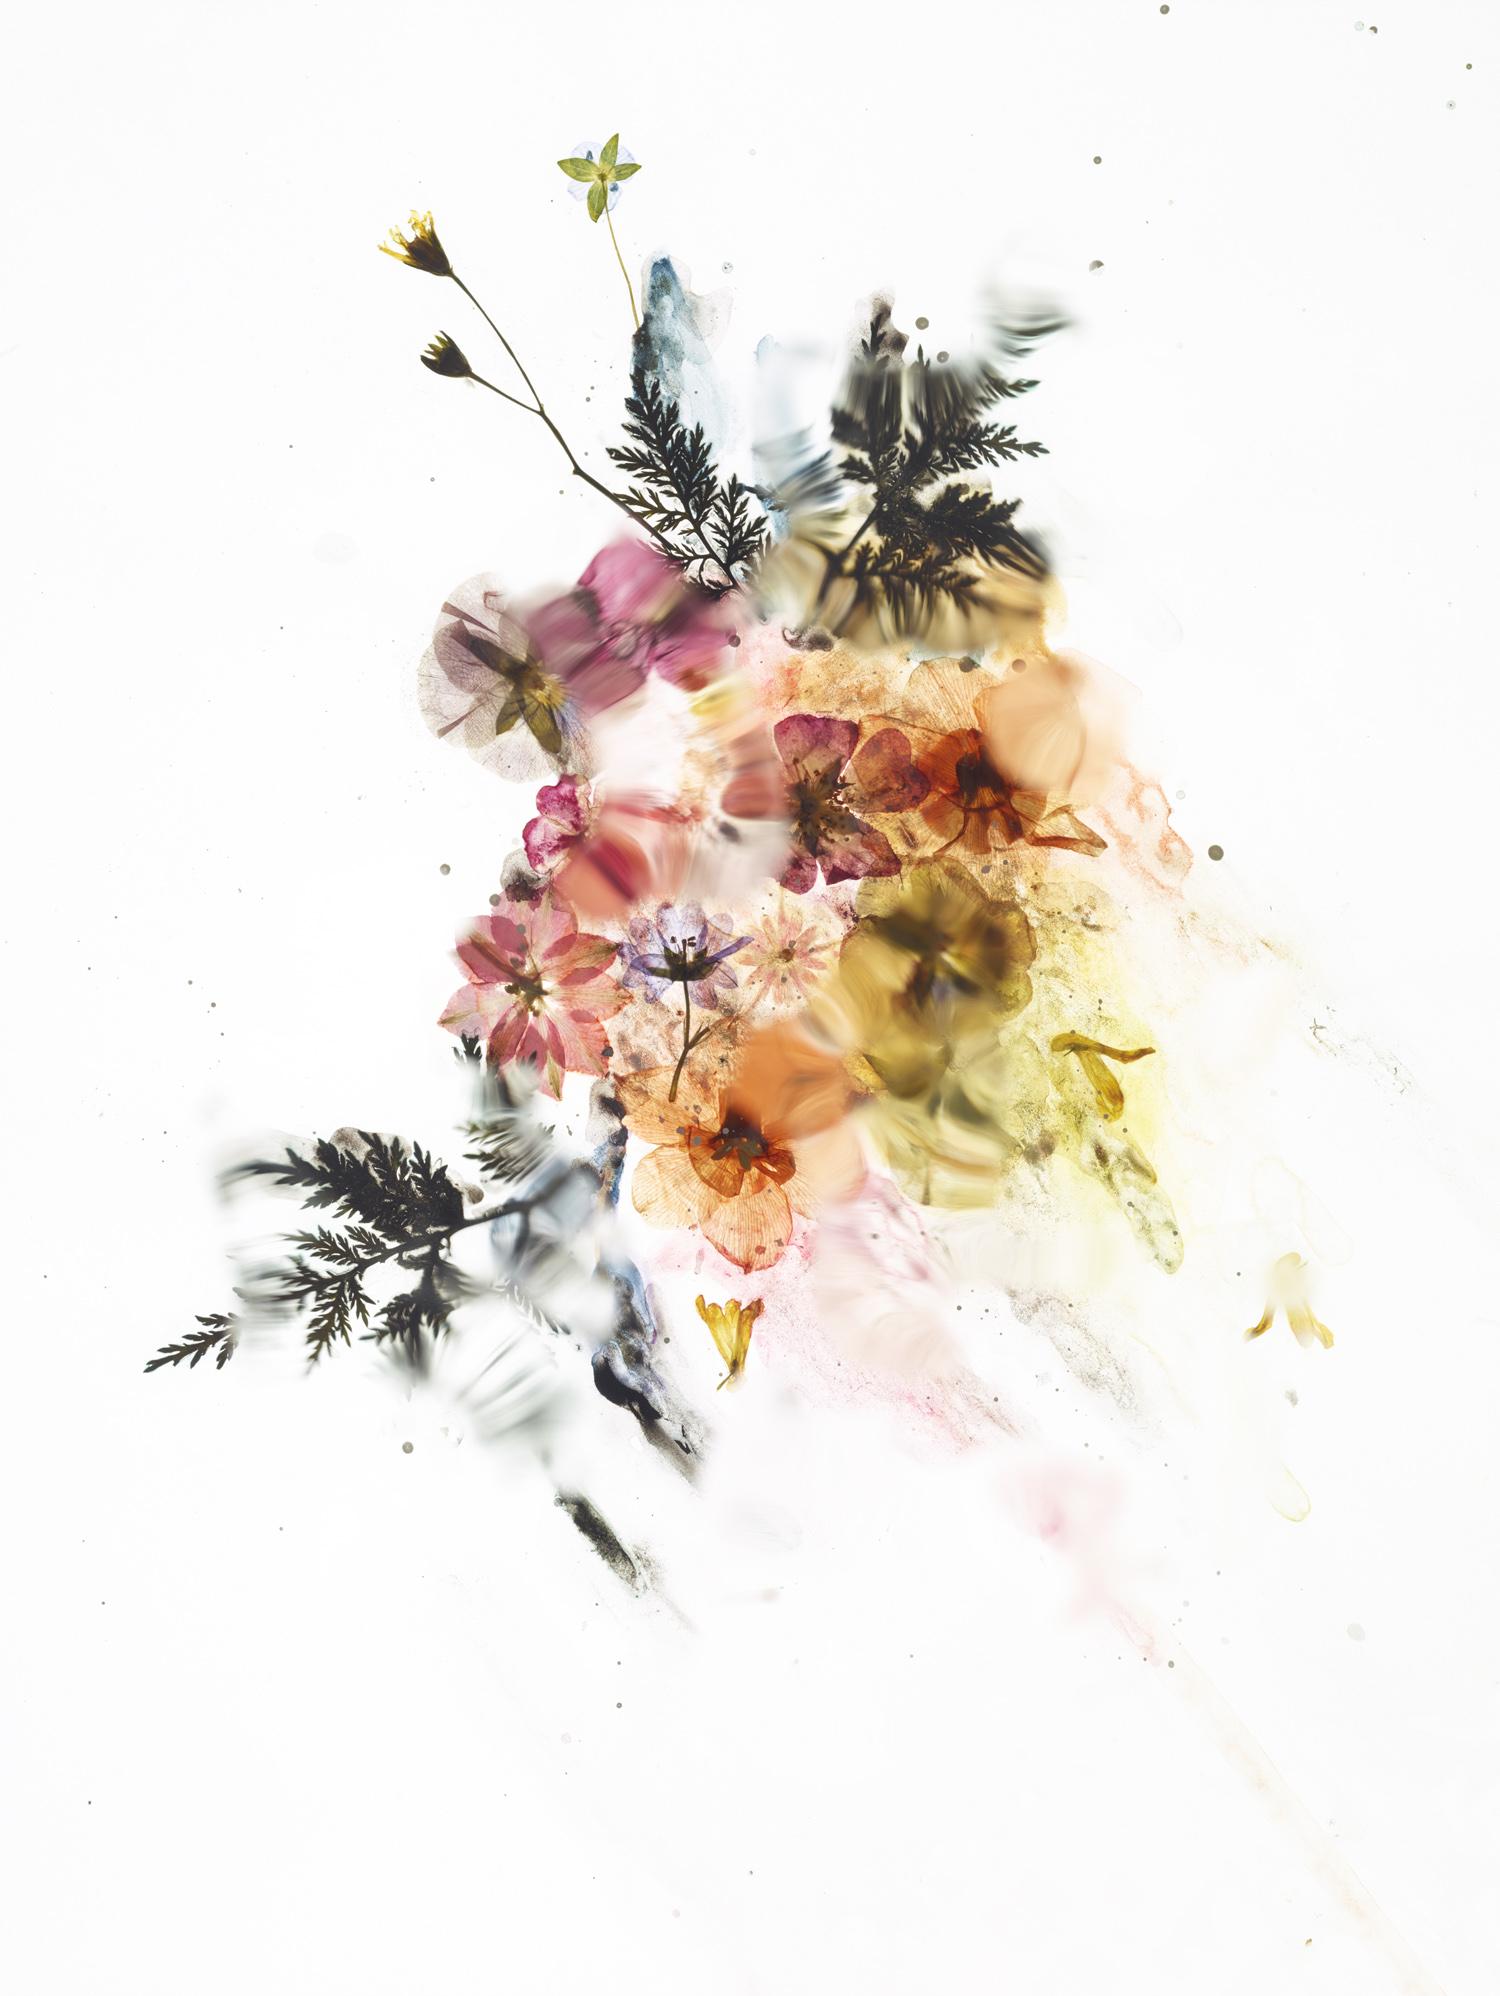 rf4201_dried_flower_test_s01_272